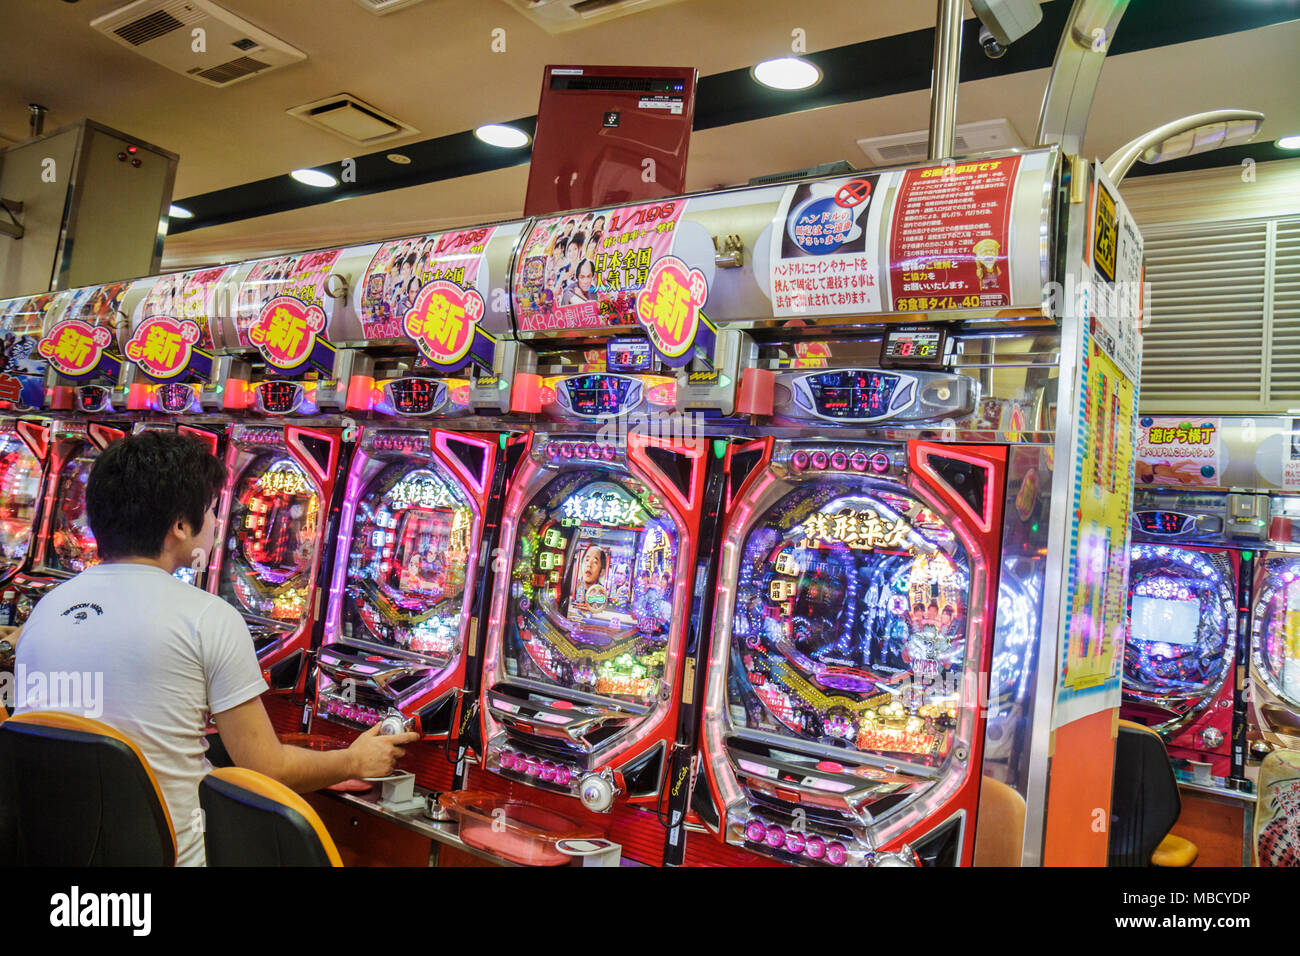 Pachinko prizes for games